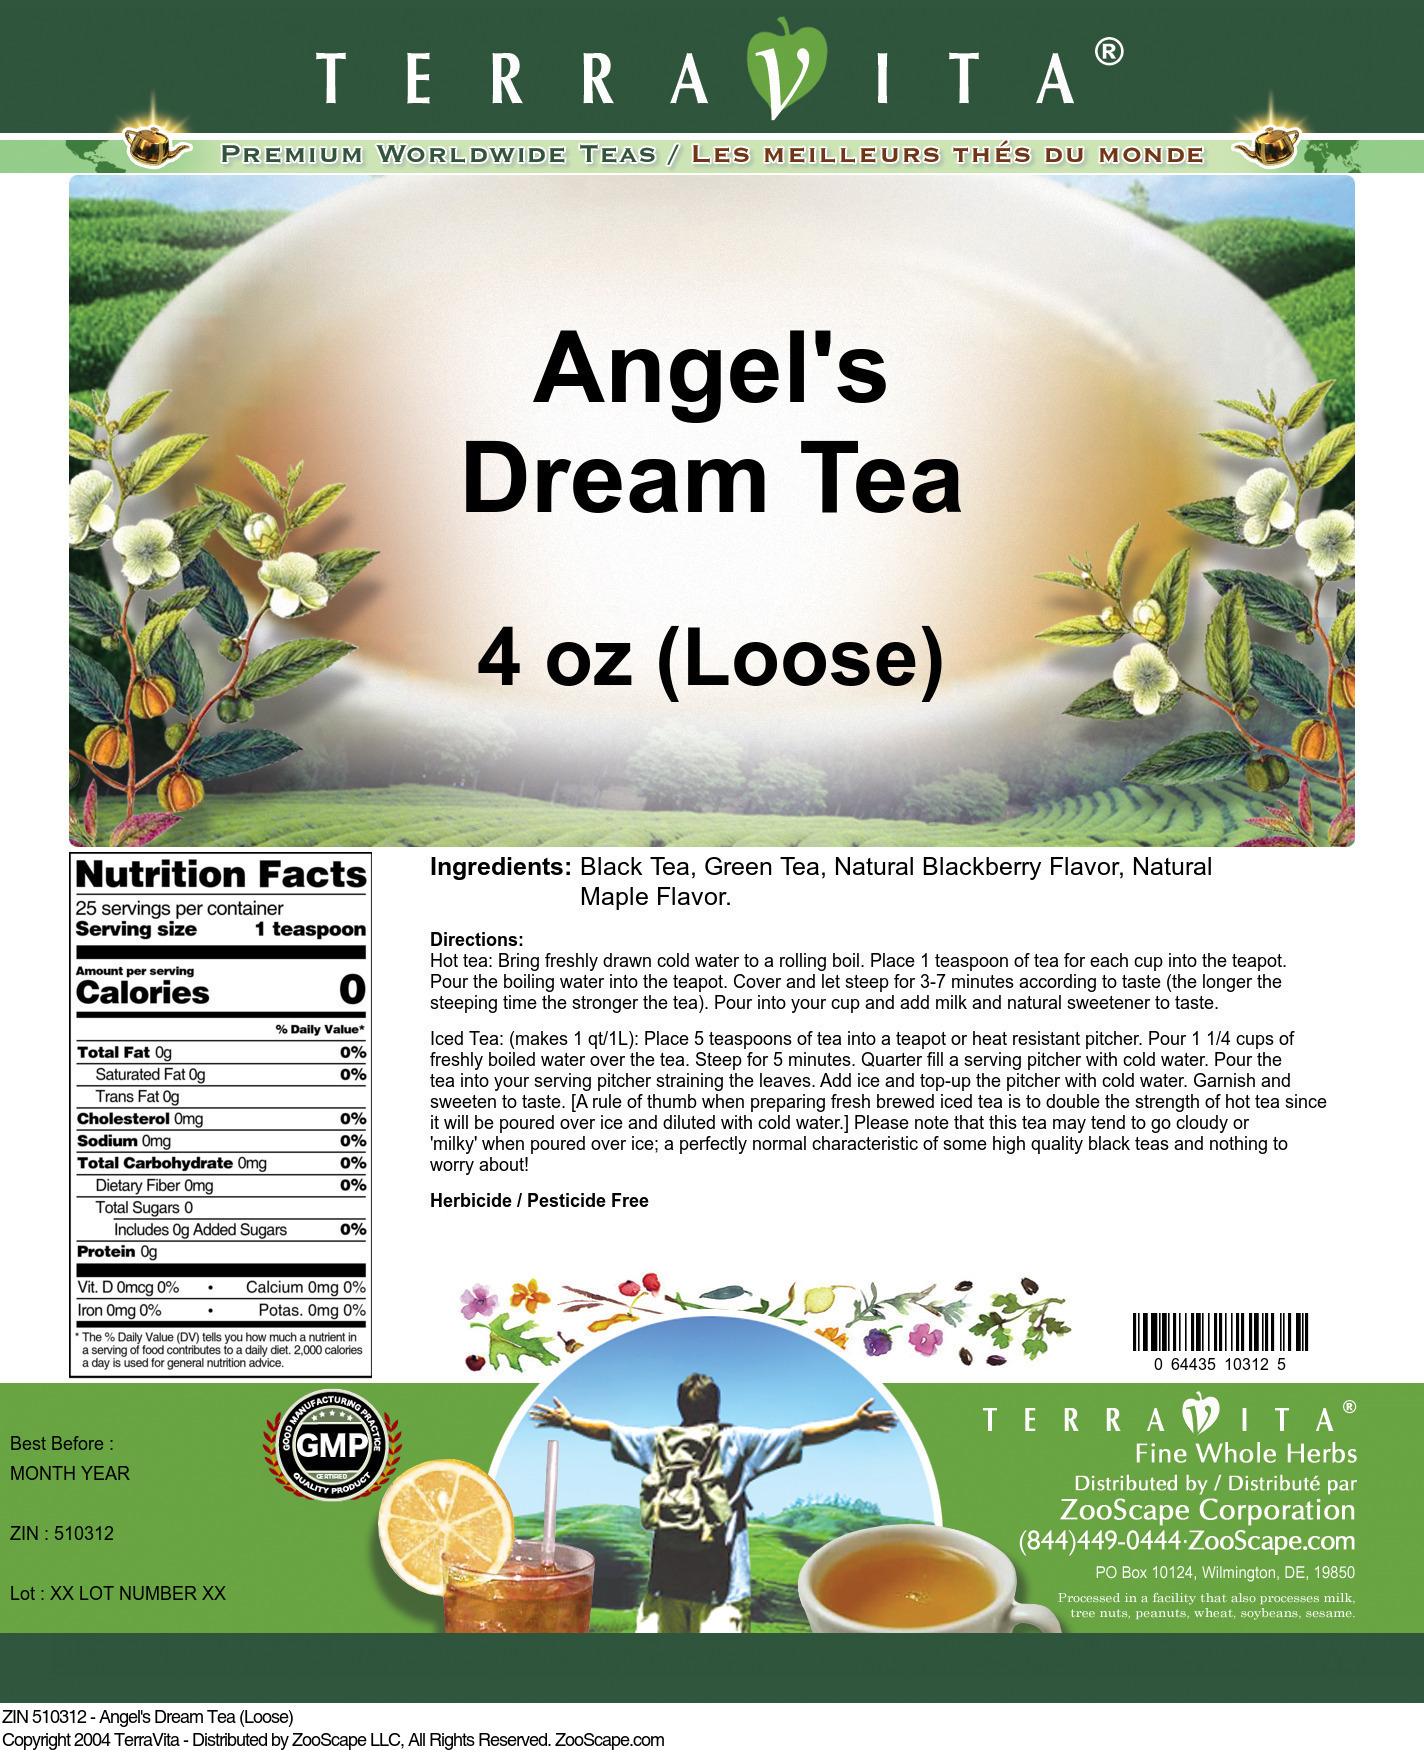 Angel's Dream Tea (Loose)